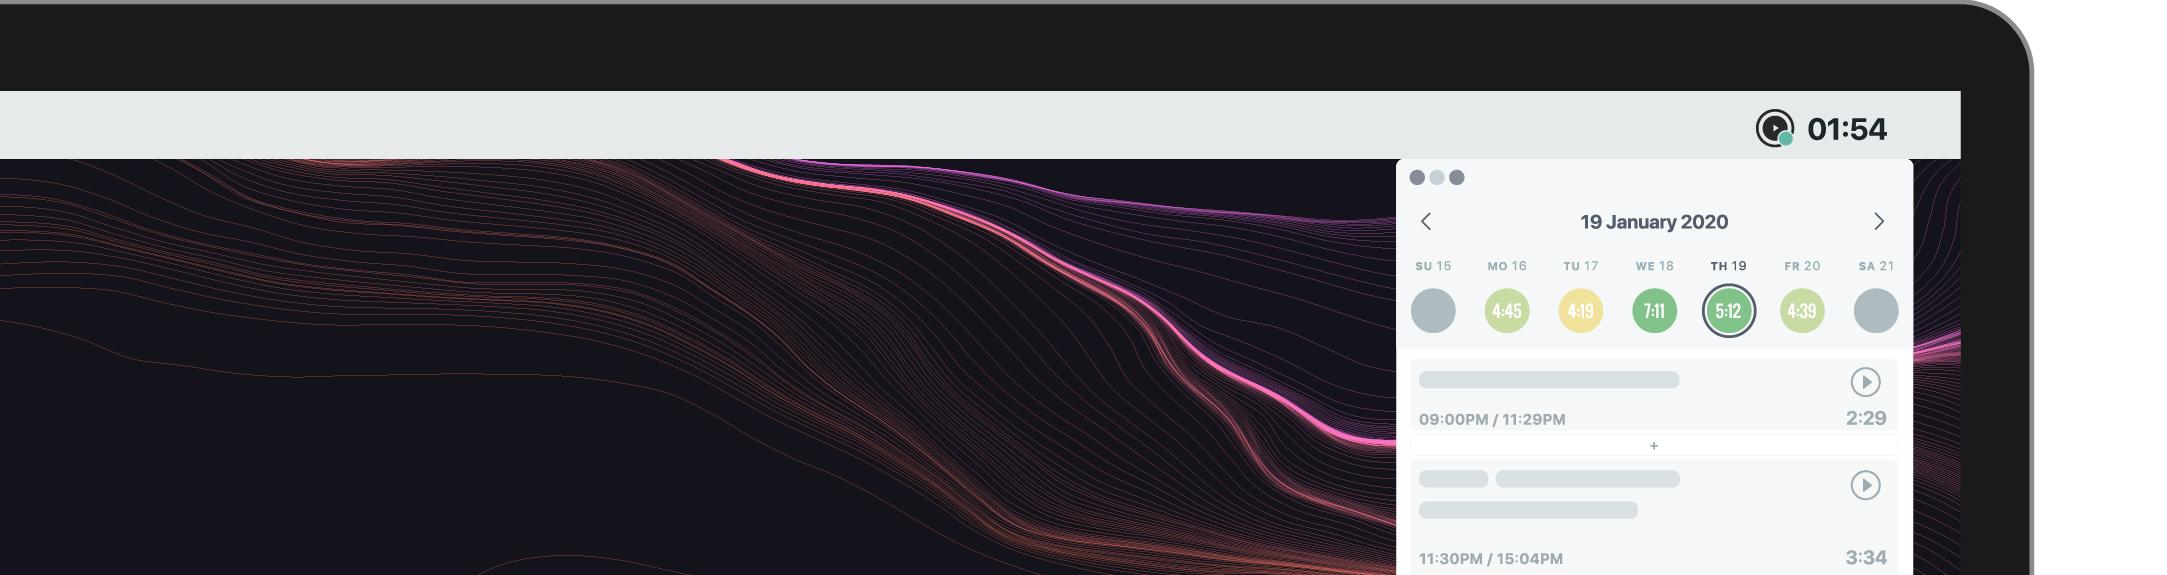 📣 New Desktop App for Windows and Mac